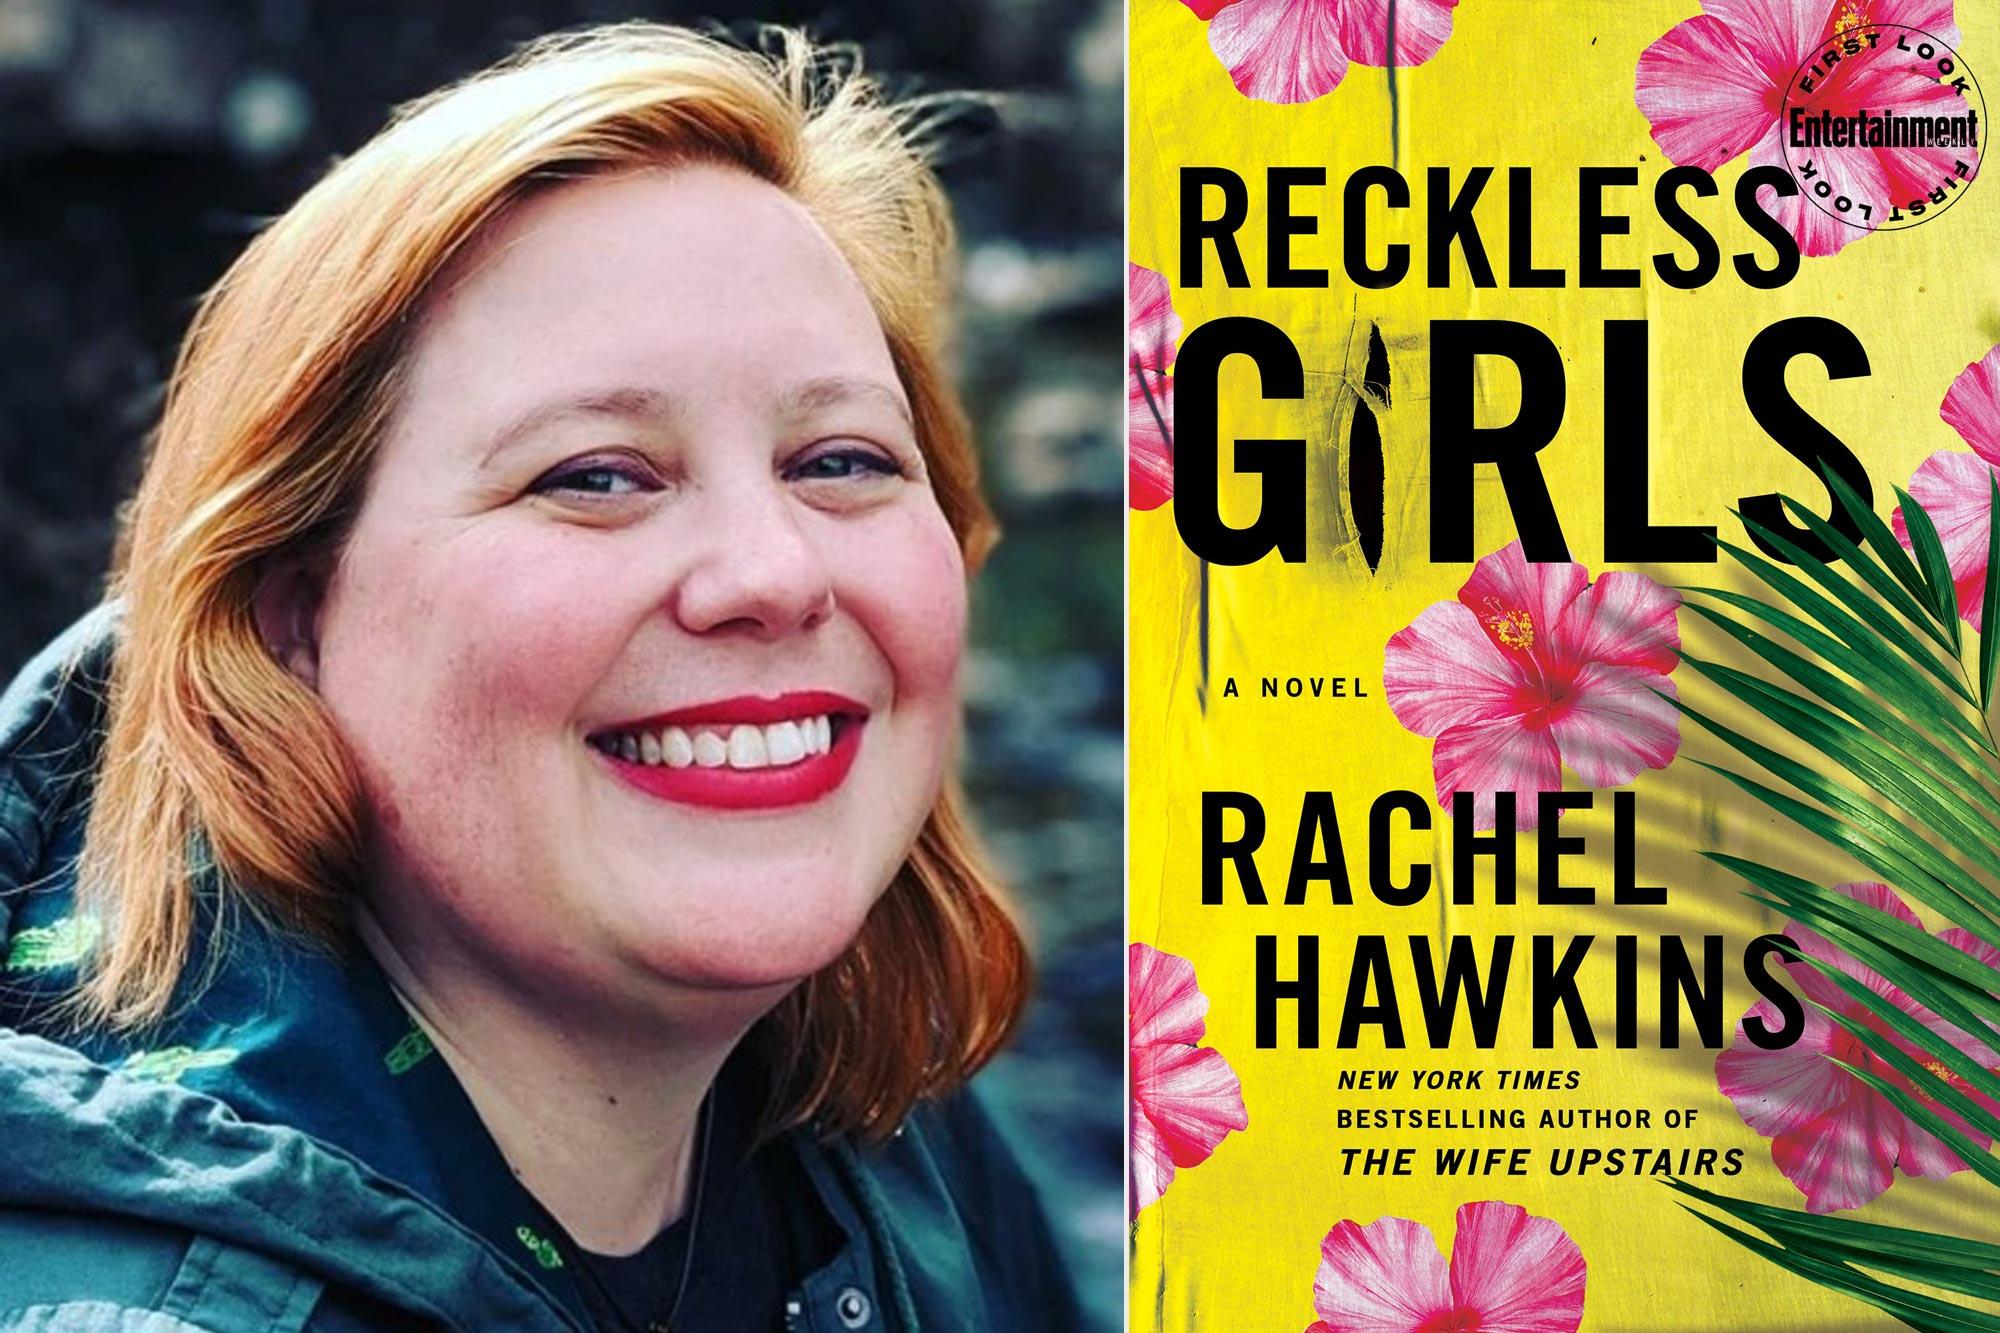 'Reckless Girls' by Rachel Hawkins